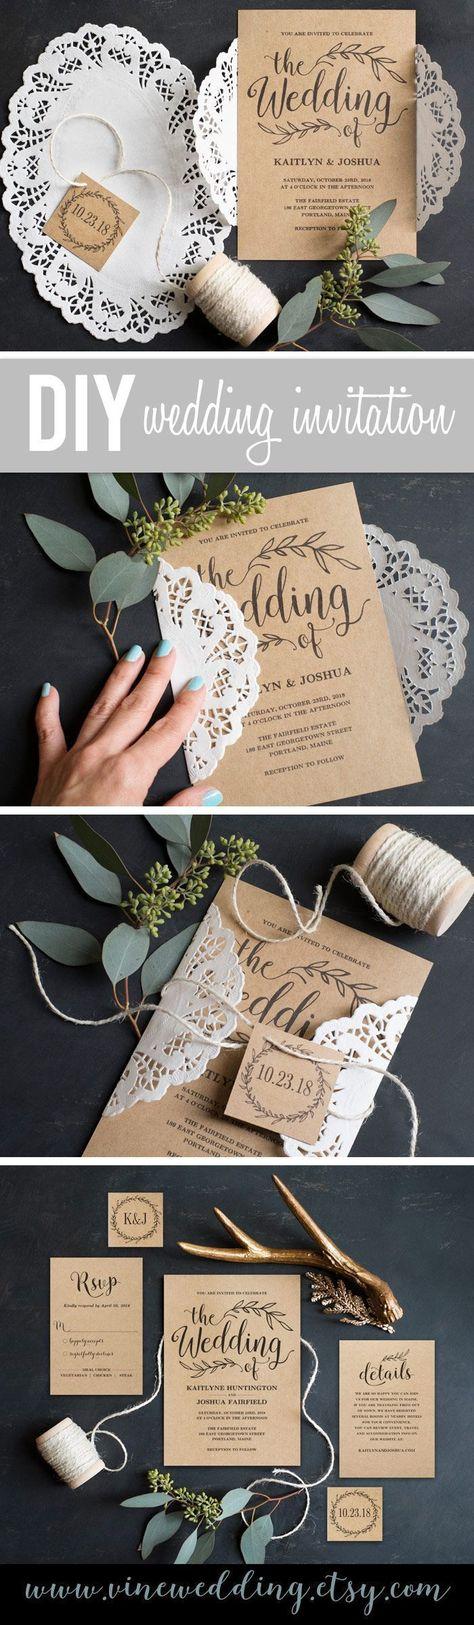 how to make invitation letter for vispurpose%0A    Easy to Make Wedding Invitation Ideas   Diy rustic weddings  Invitation  ideas and Diy winter weddings